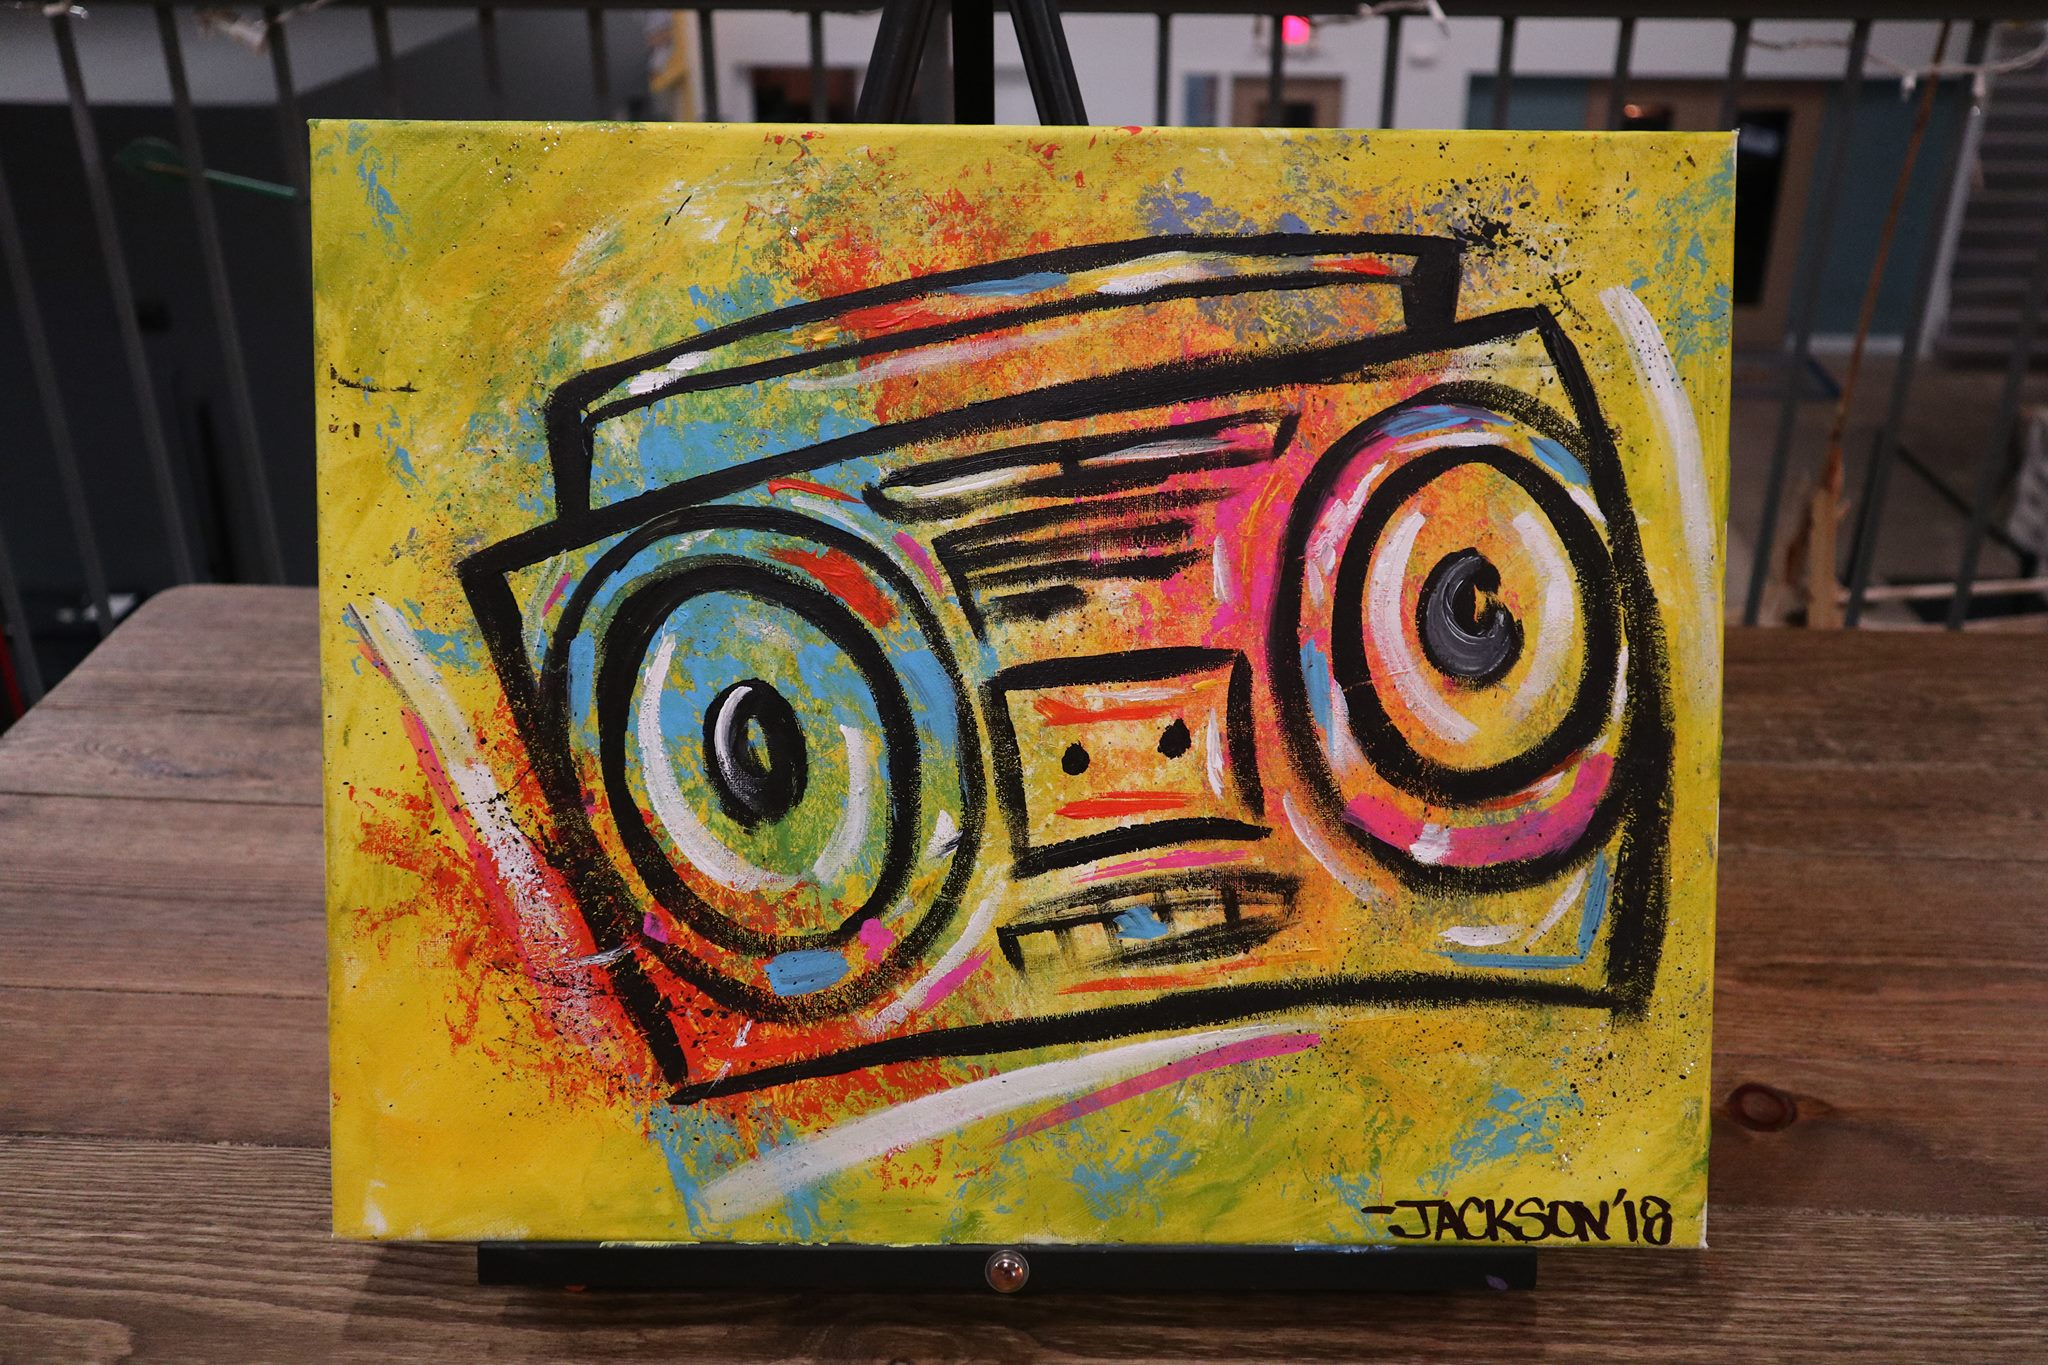 Boombox - Jackson